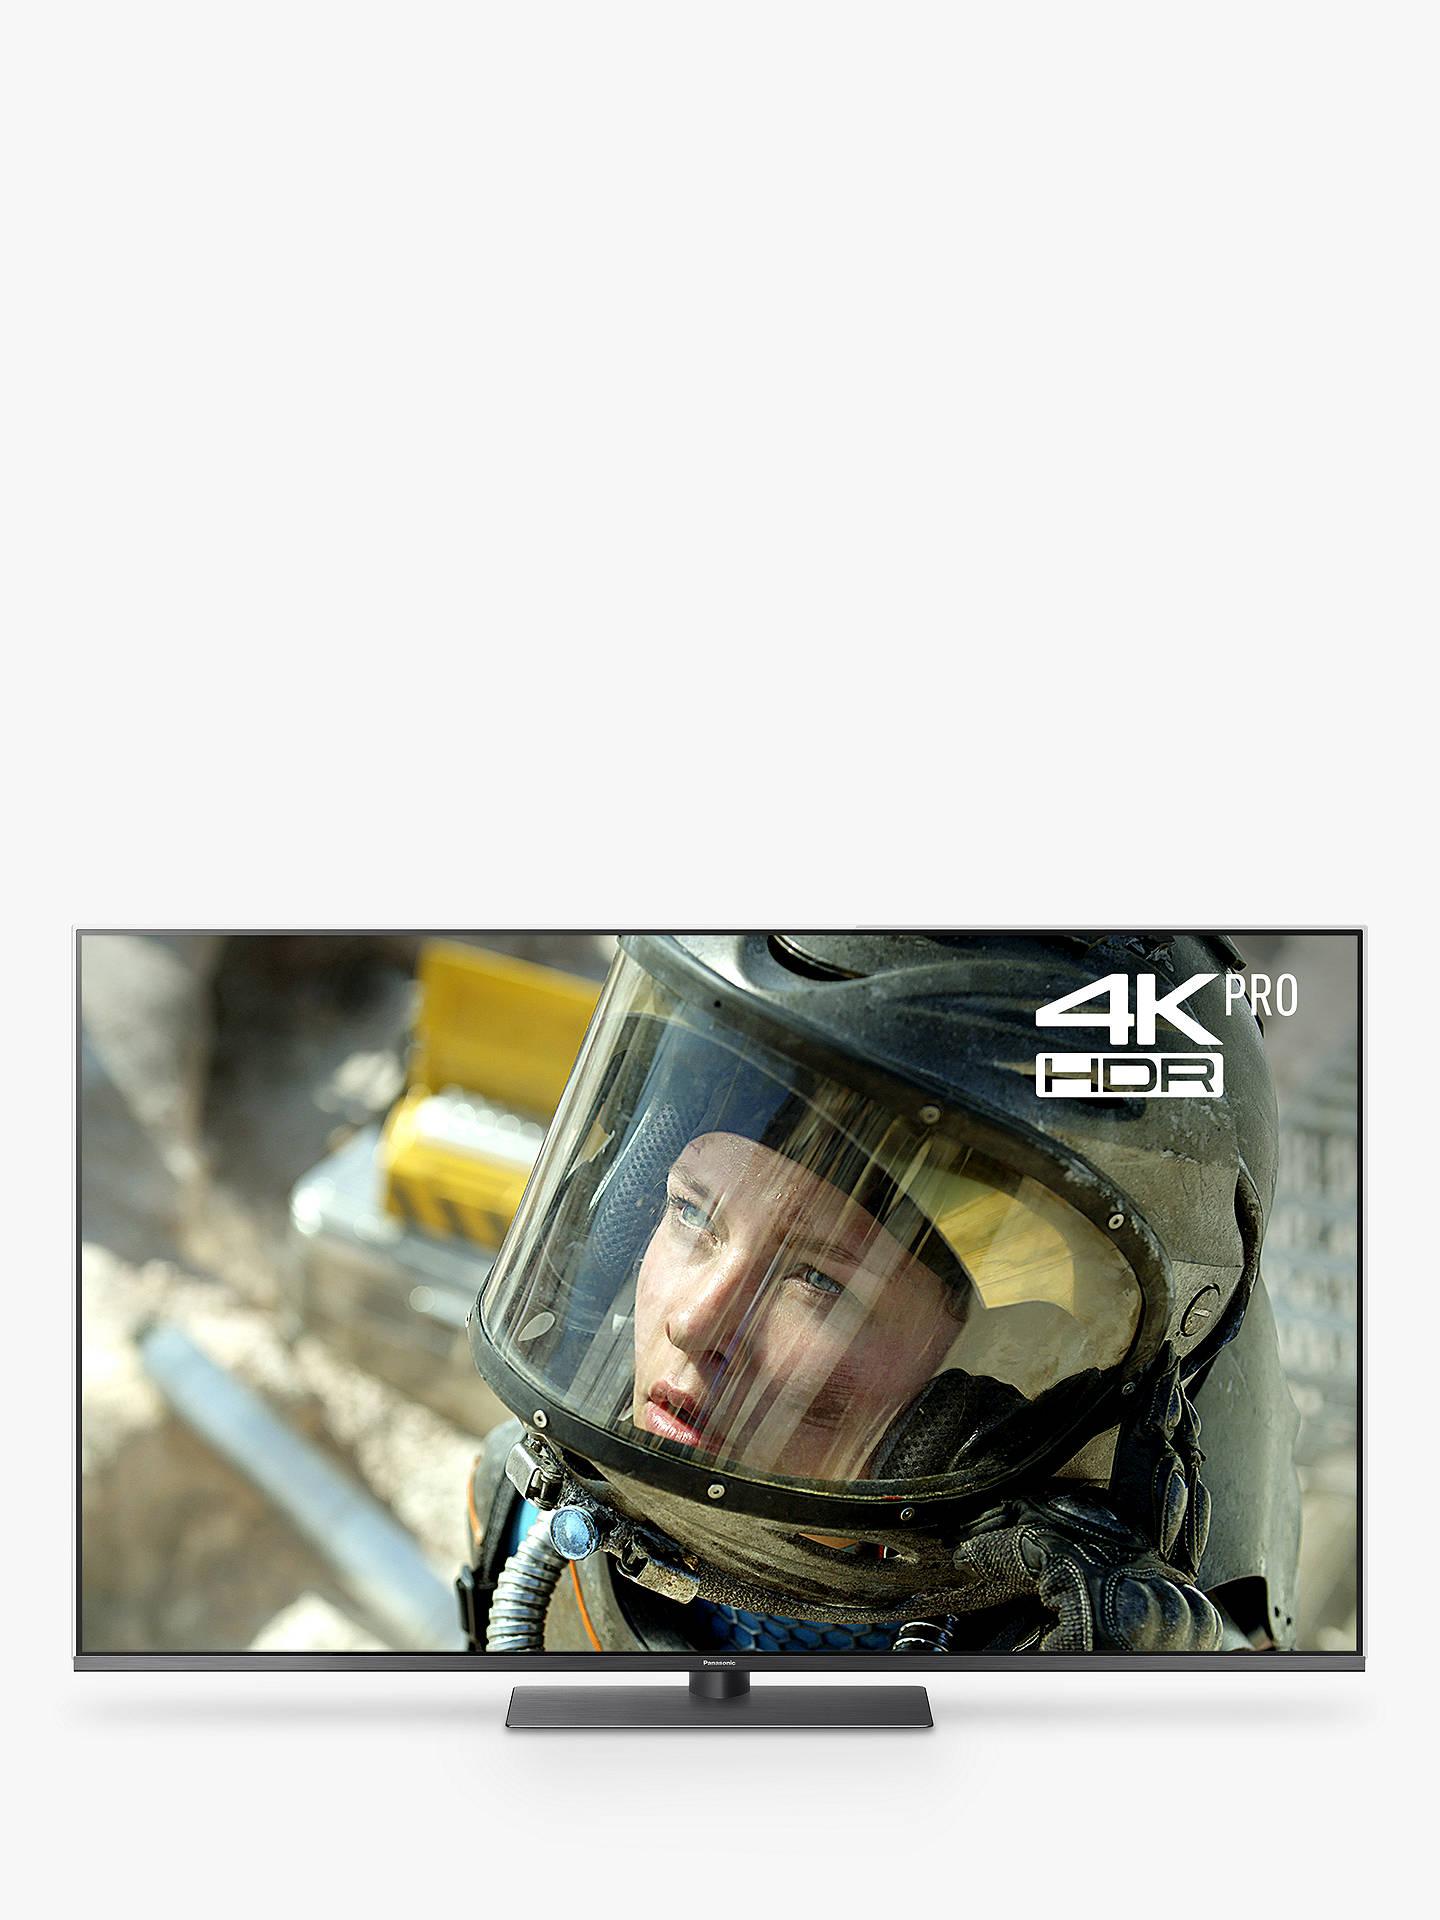 Panasonic TX-65FX750B LED HDR 4K Ultra HD Smart TV, 65